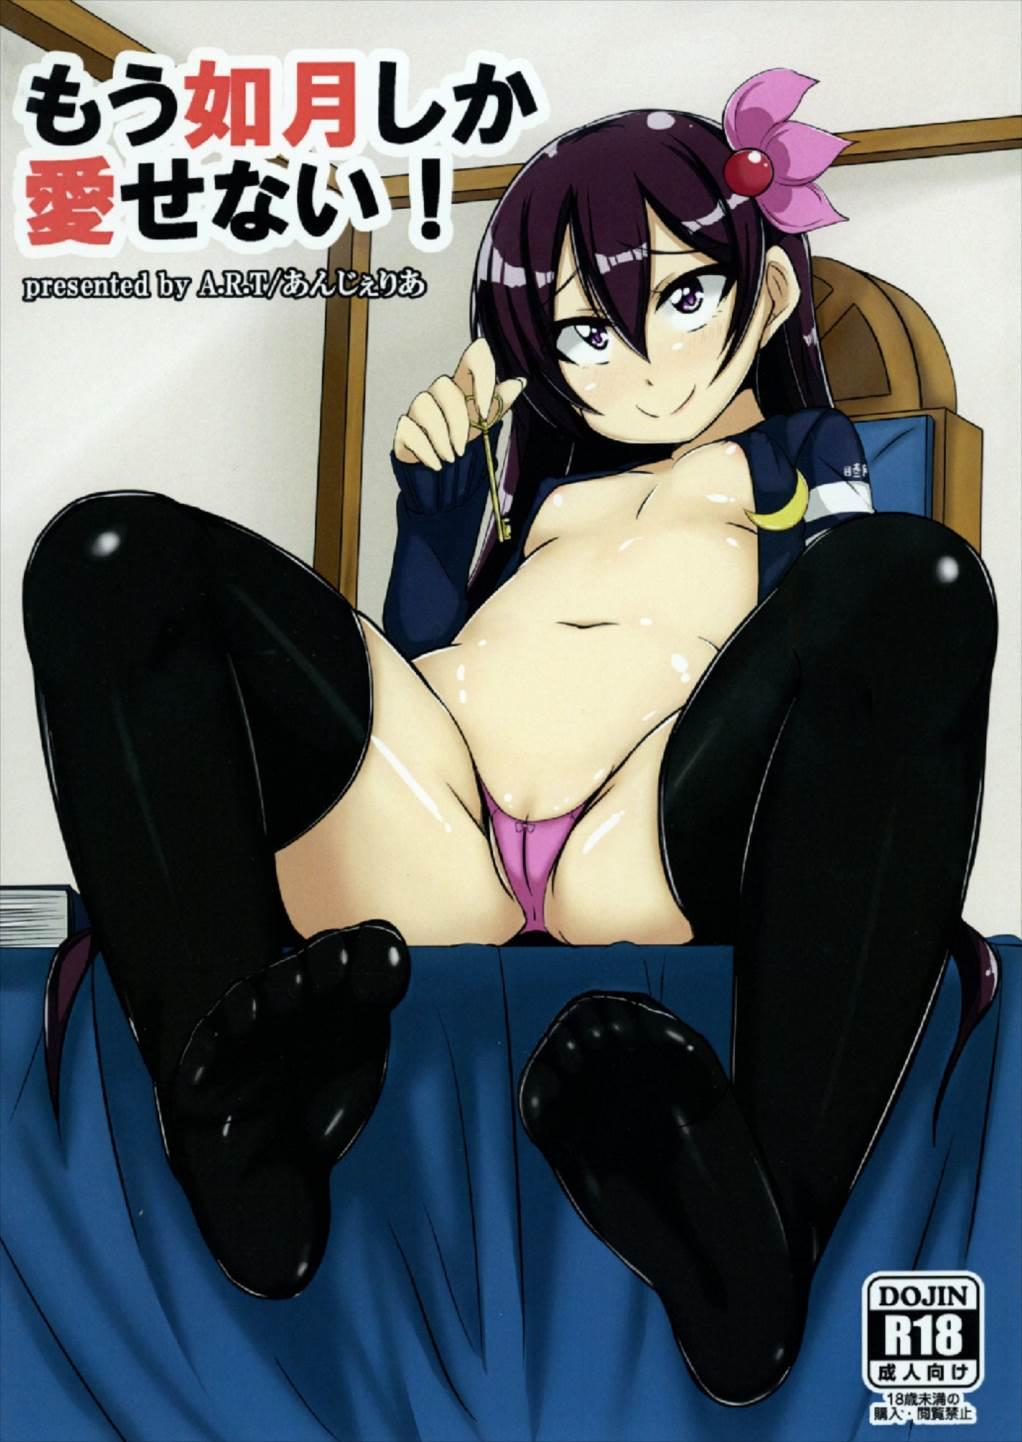 Mou Kisaragi Shika Aisenai! 0